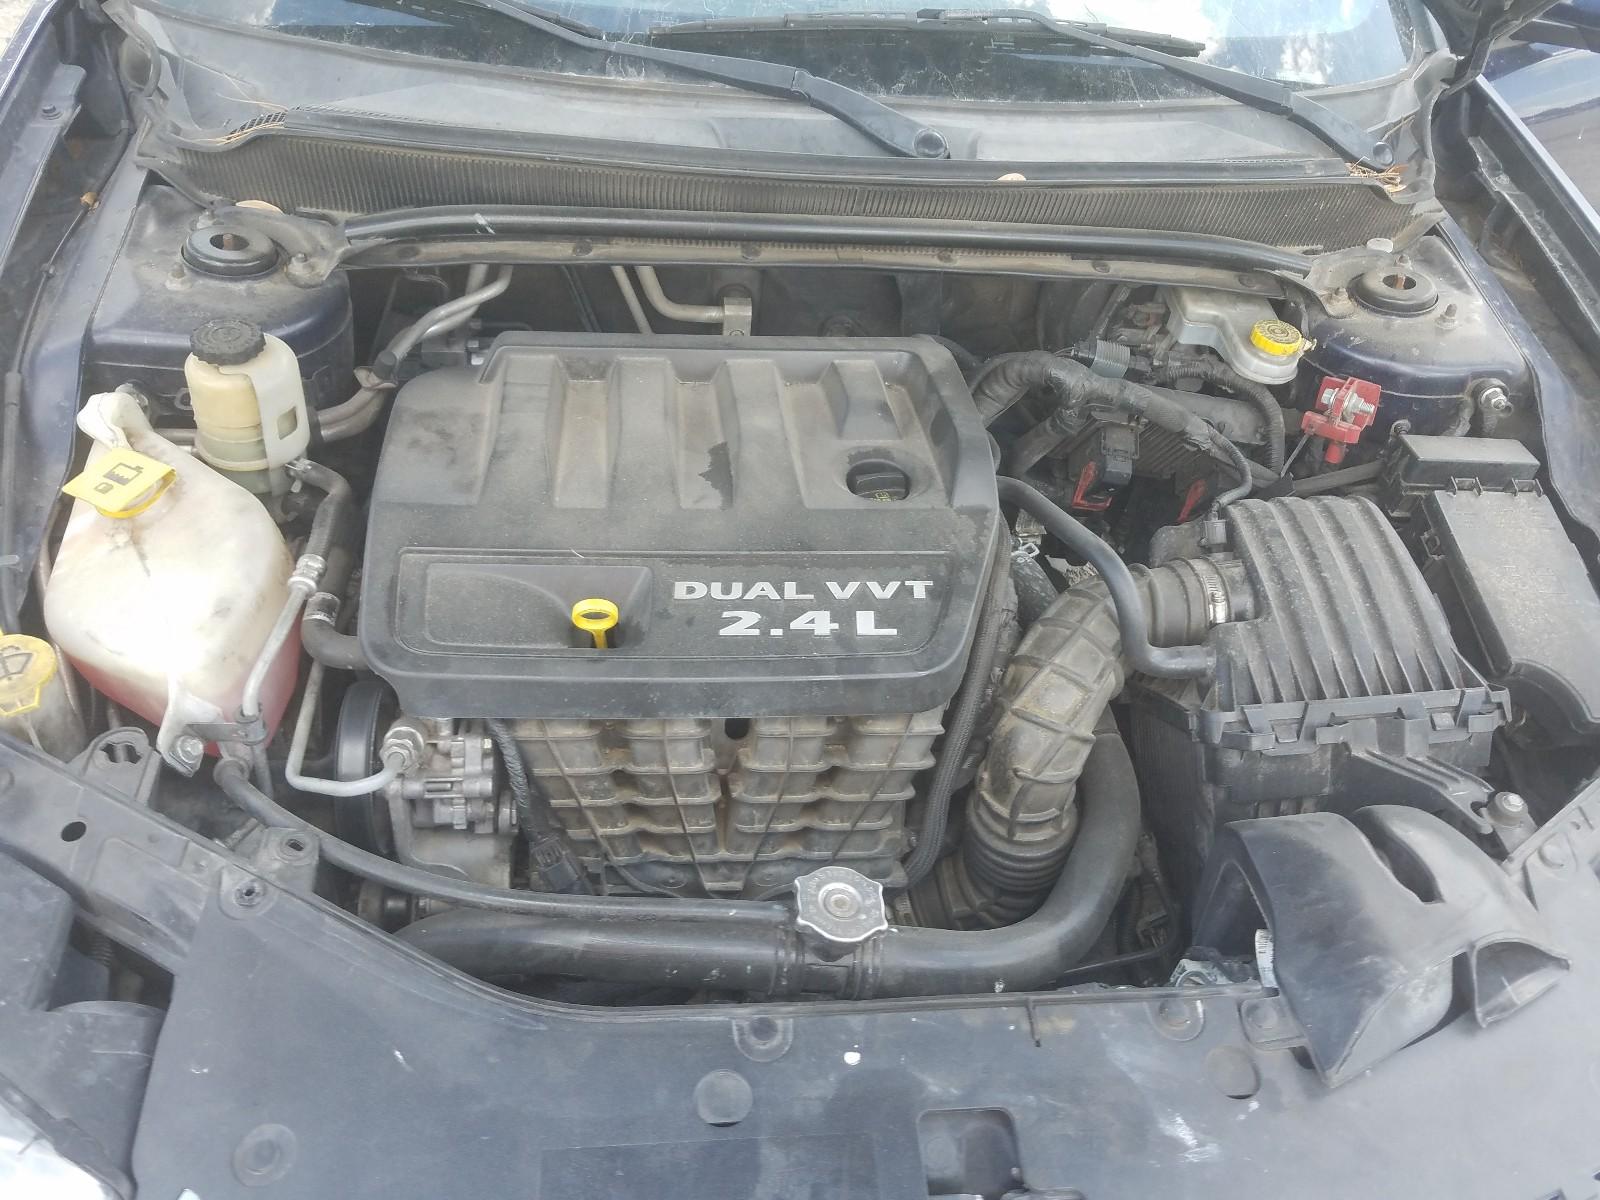 1C3CDZCB4DN693221 - 2013 Dodge Avenger Sx 2.4L inside view